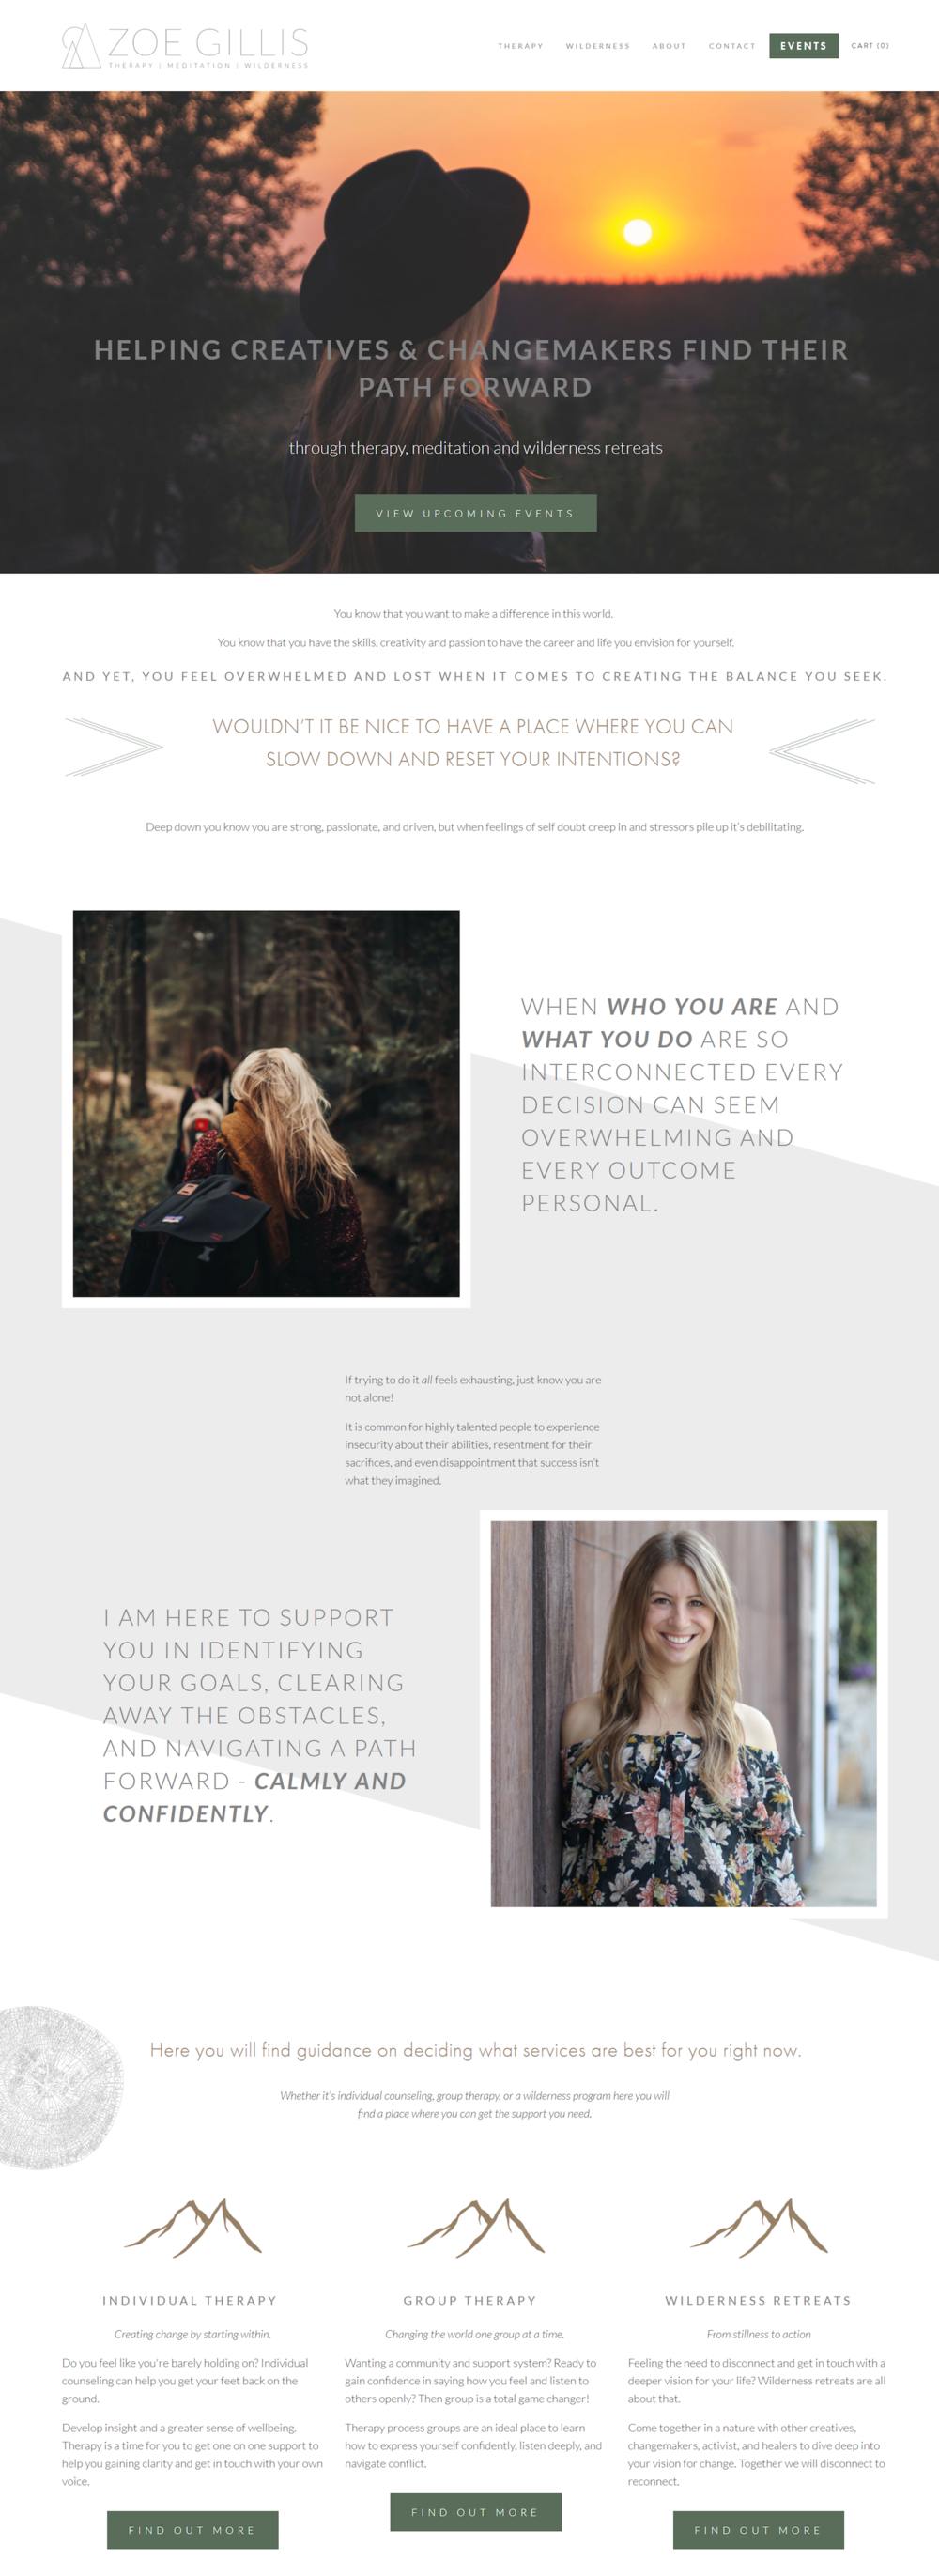 Zoe Gillis Website Pinterest - Homepage.png